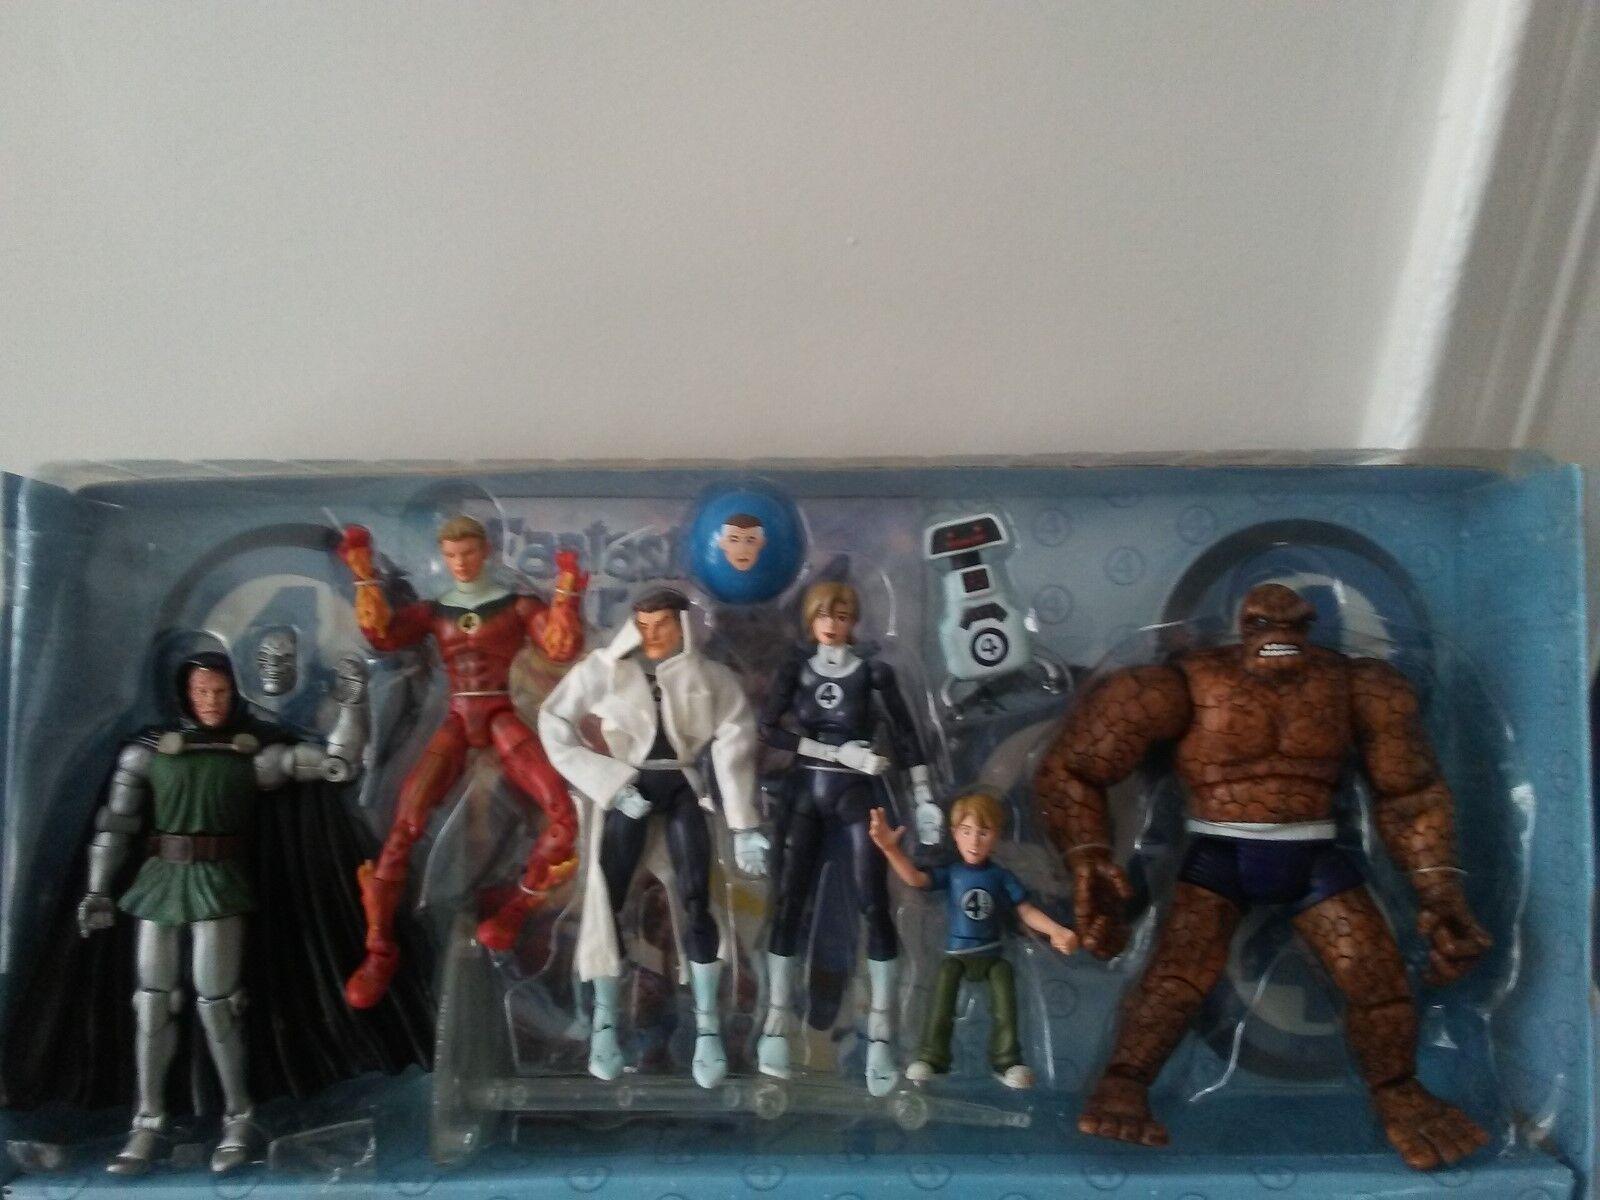 Marvel Legends Fantastic Four Action Figure set, Toy Biz 2000  70396